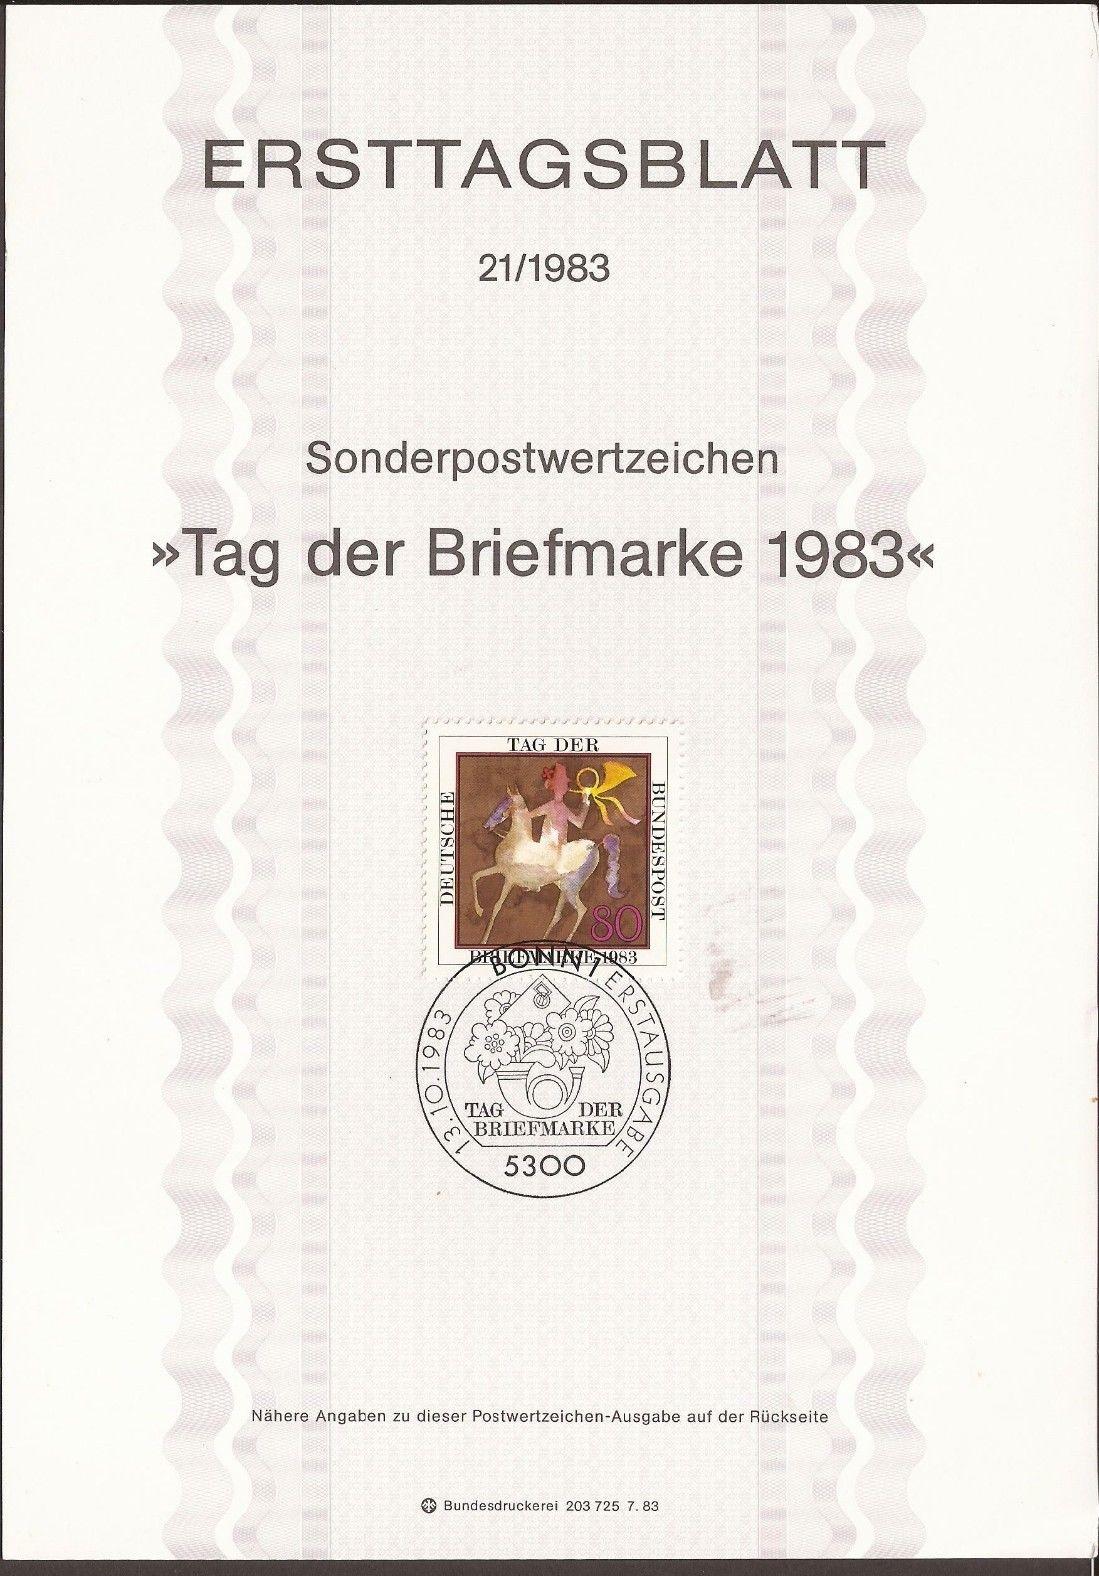 Germany - Scott #1405 (1983) - Ersttagsblatt (first day card)